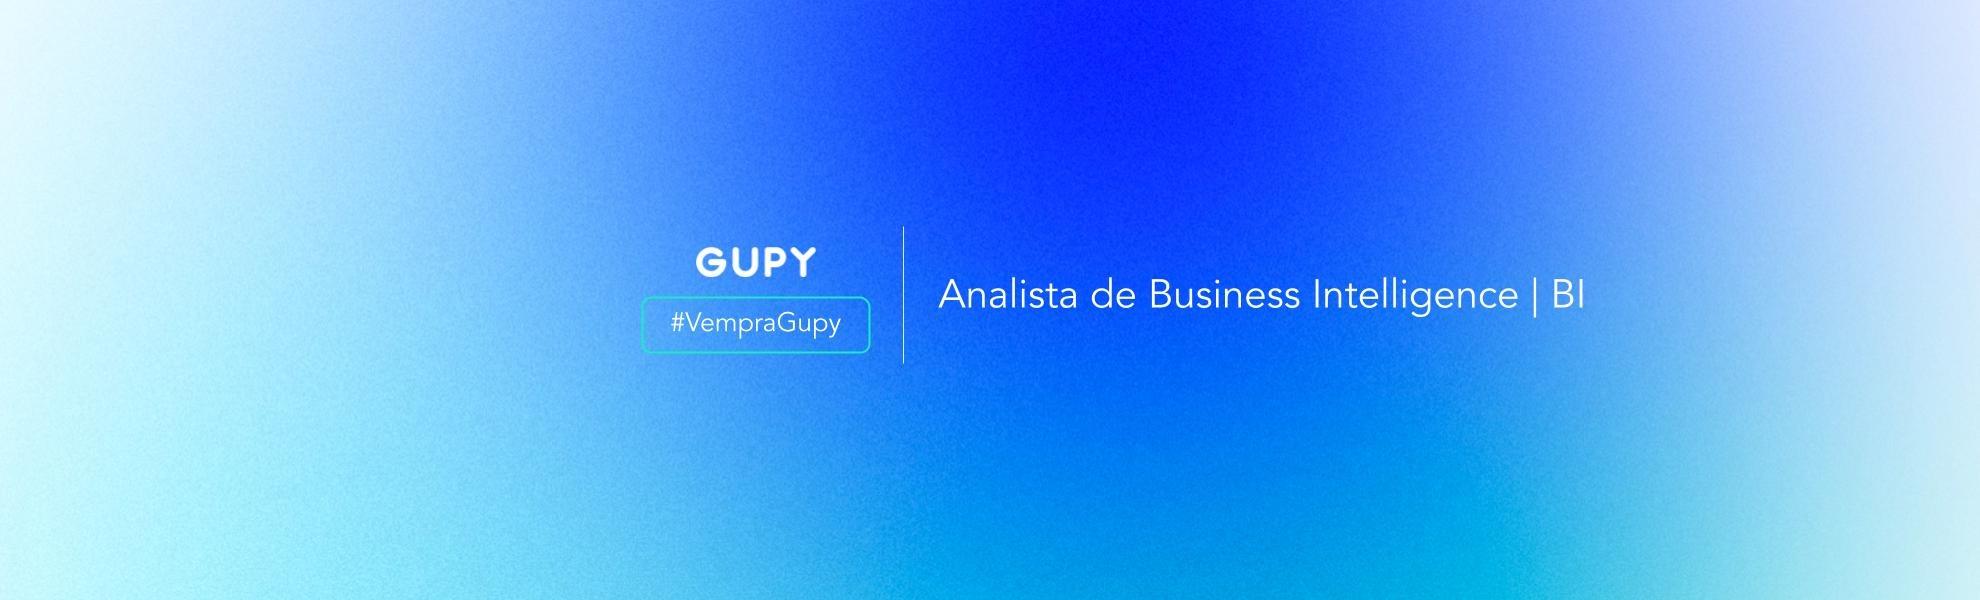 Analista de Business Intelligence | BI